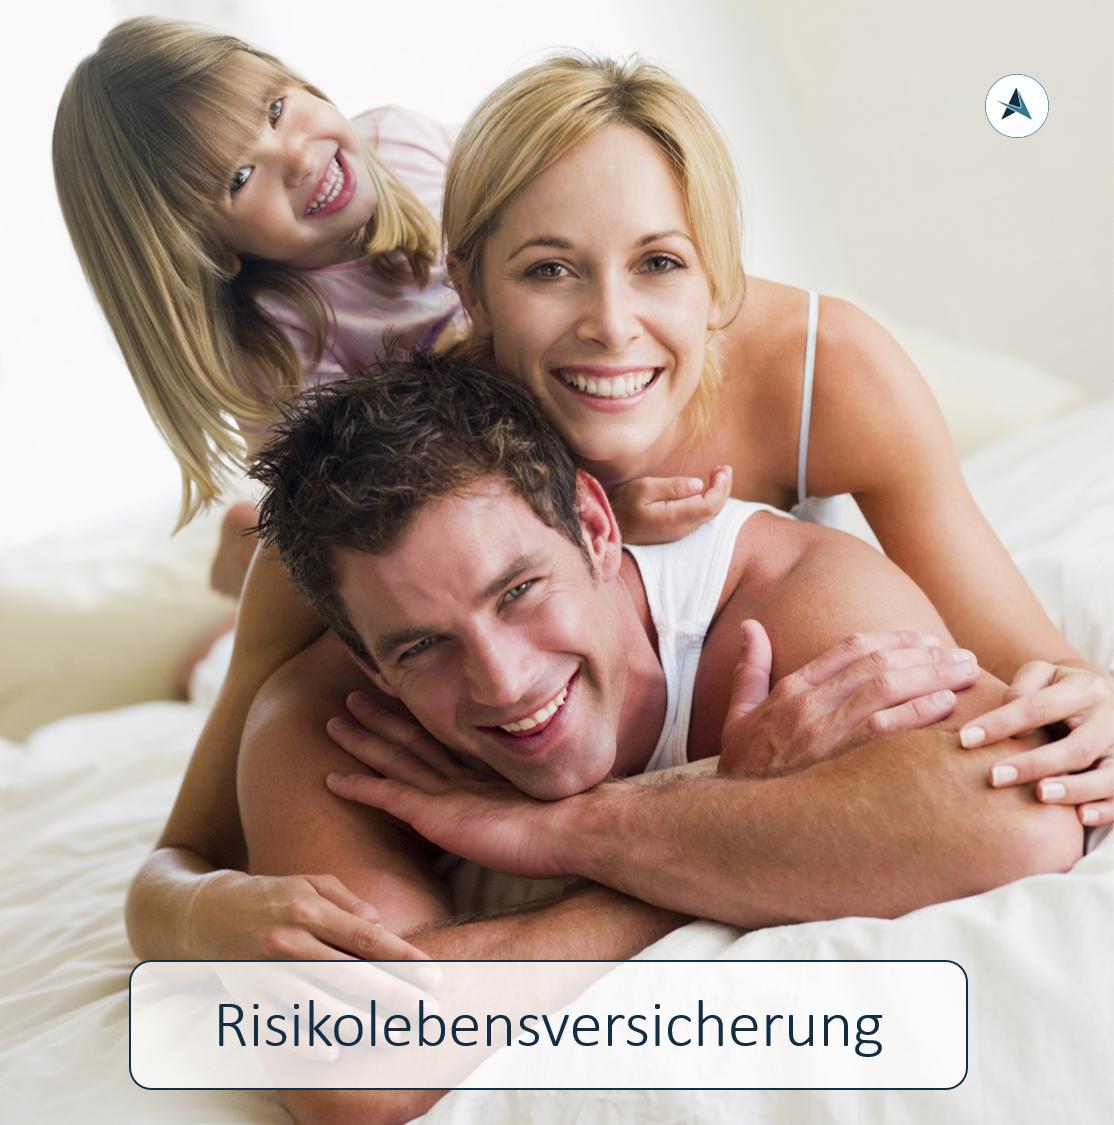 Versicherungsmakler-Berlin-Lichtenberg-Risikolebensversicherung-André-Böttcher-Risiko-Leben